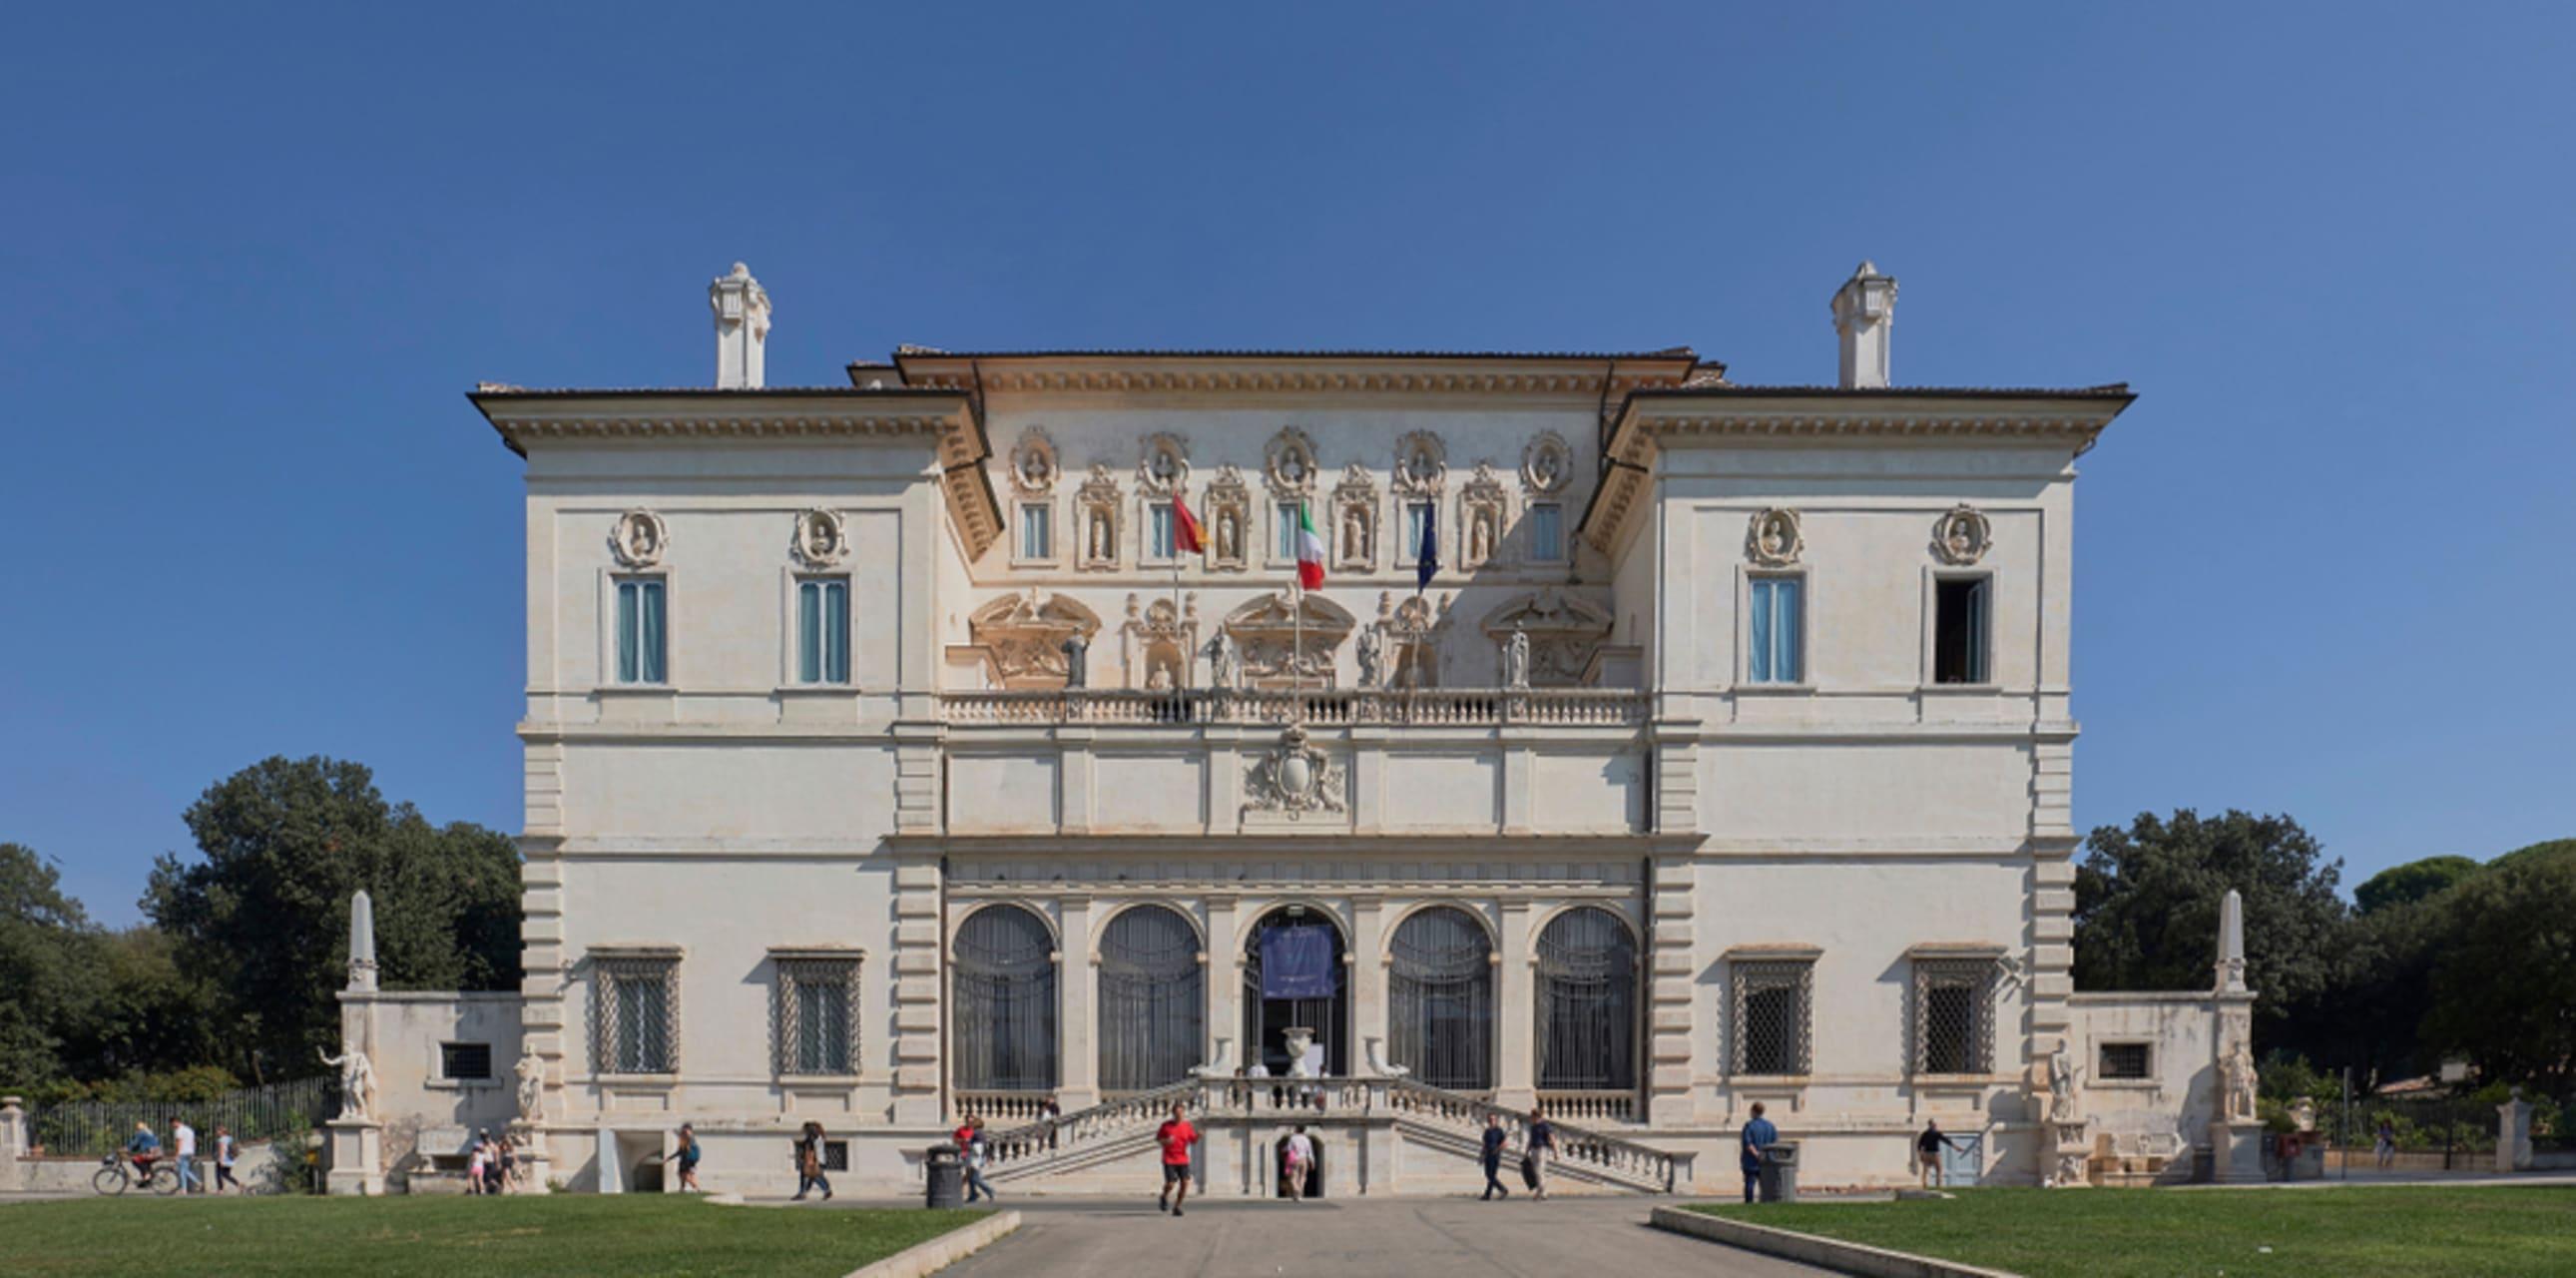 Rome - Villa Borghese - Part 1